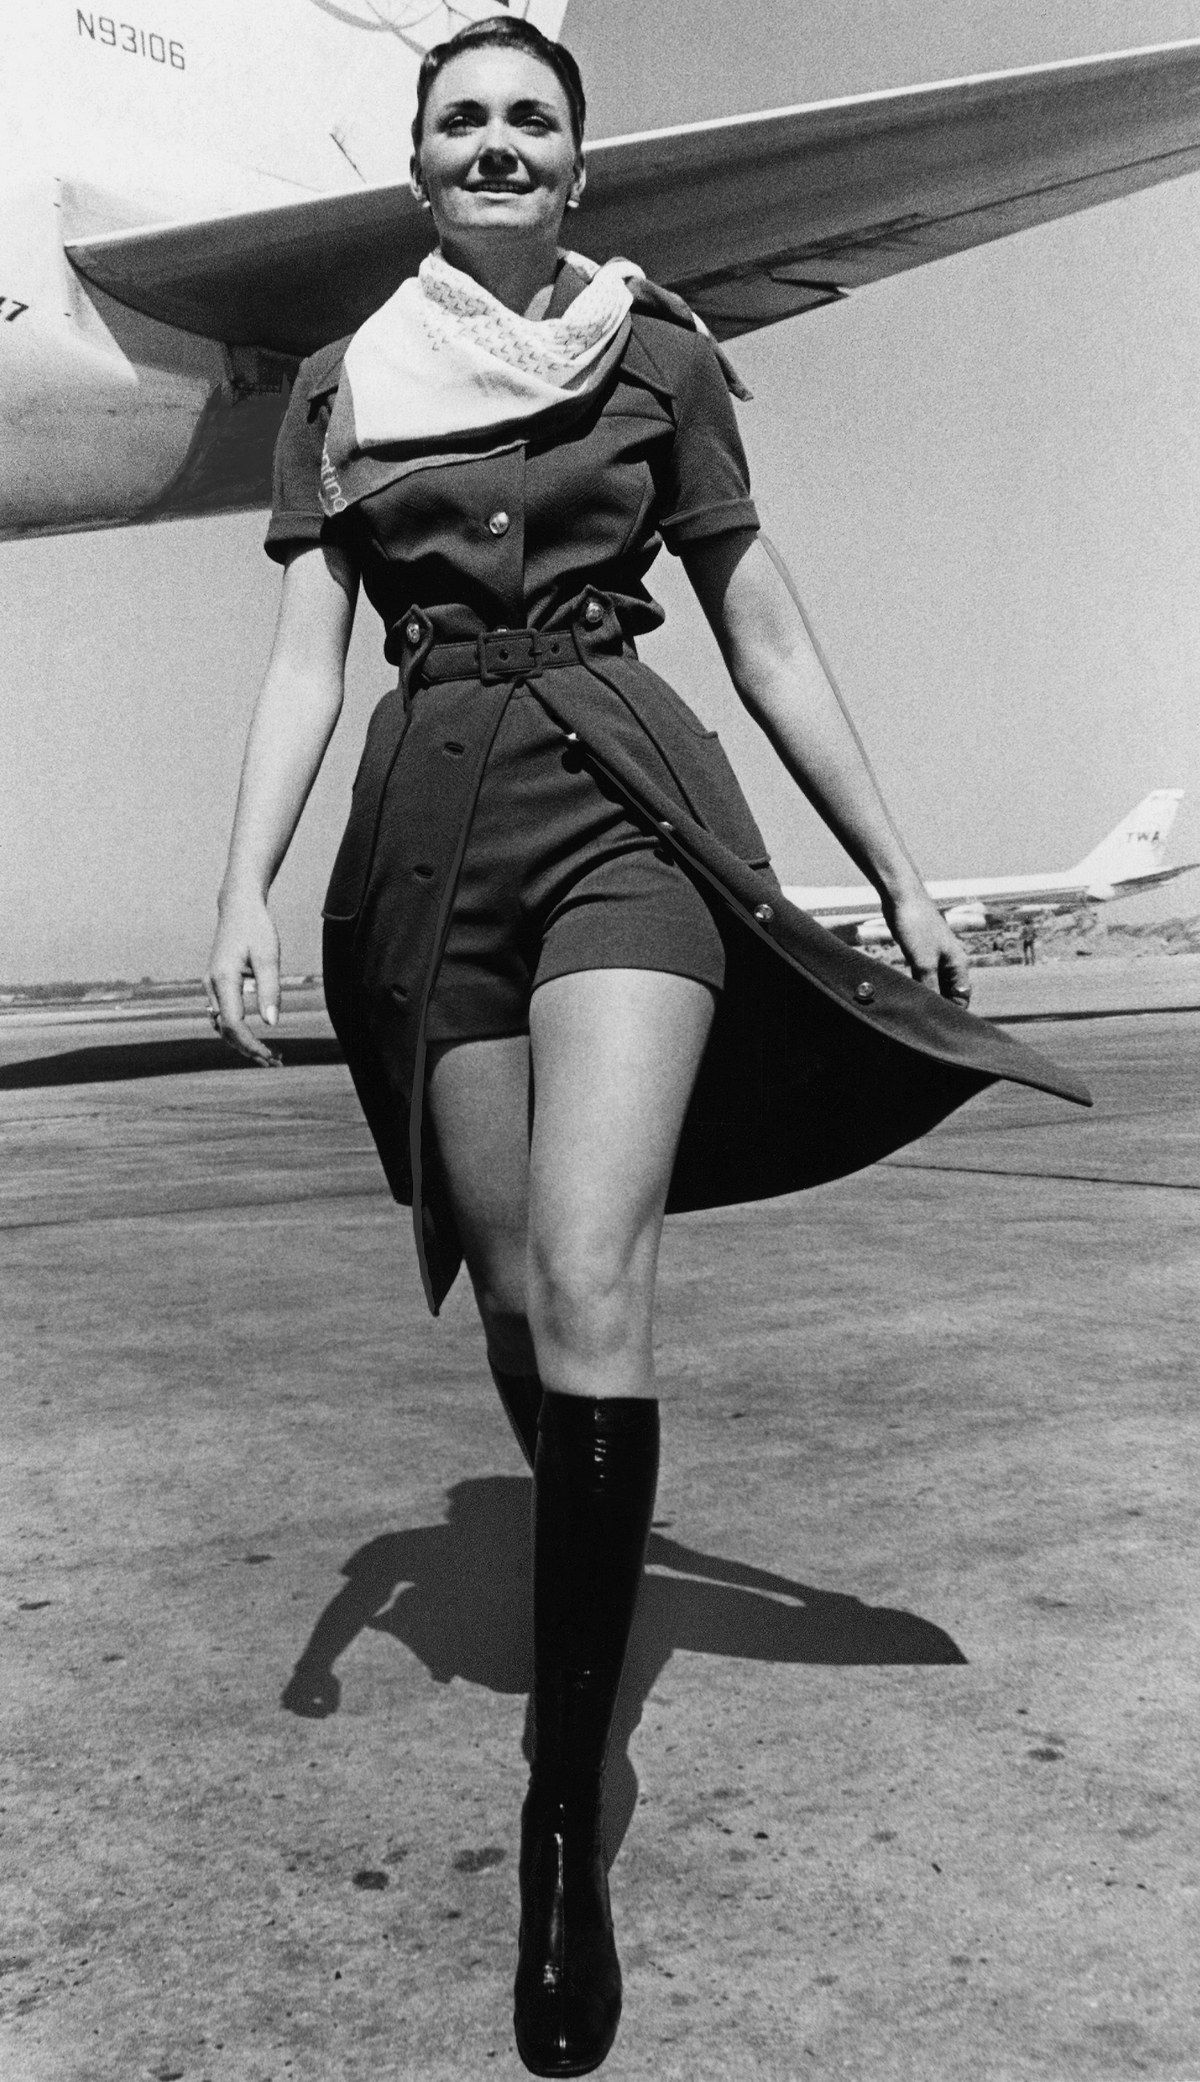 Air Hostess Uniforms by Fashion Designers Air hostess